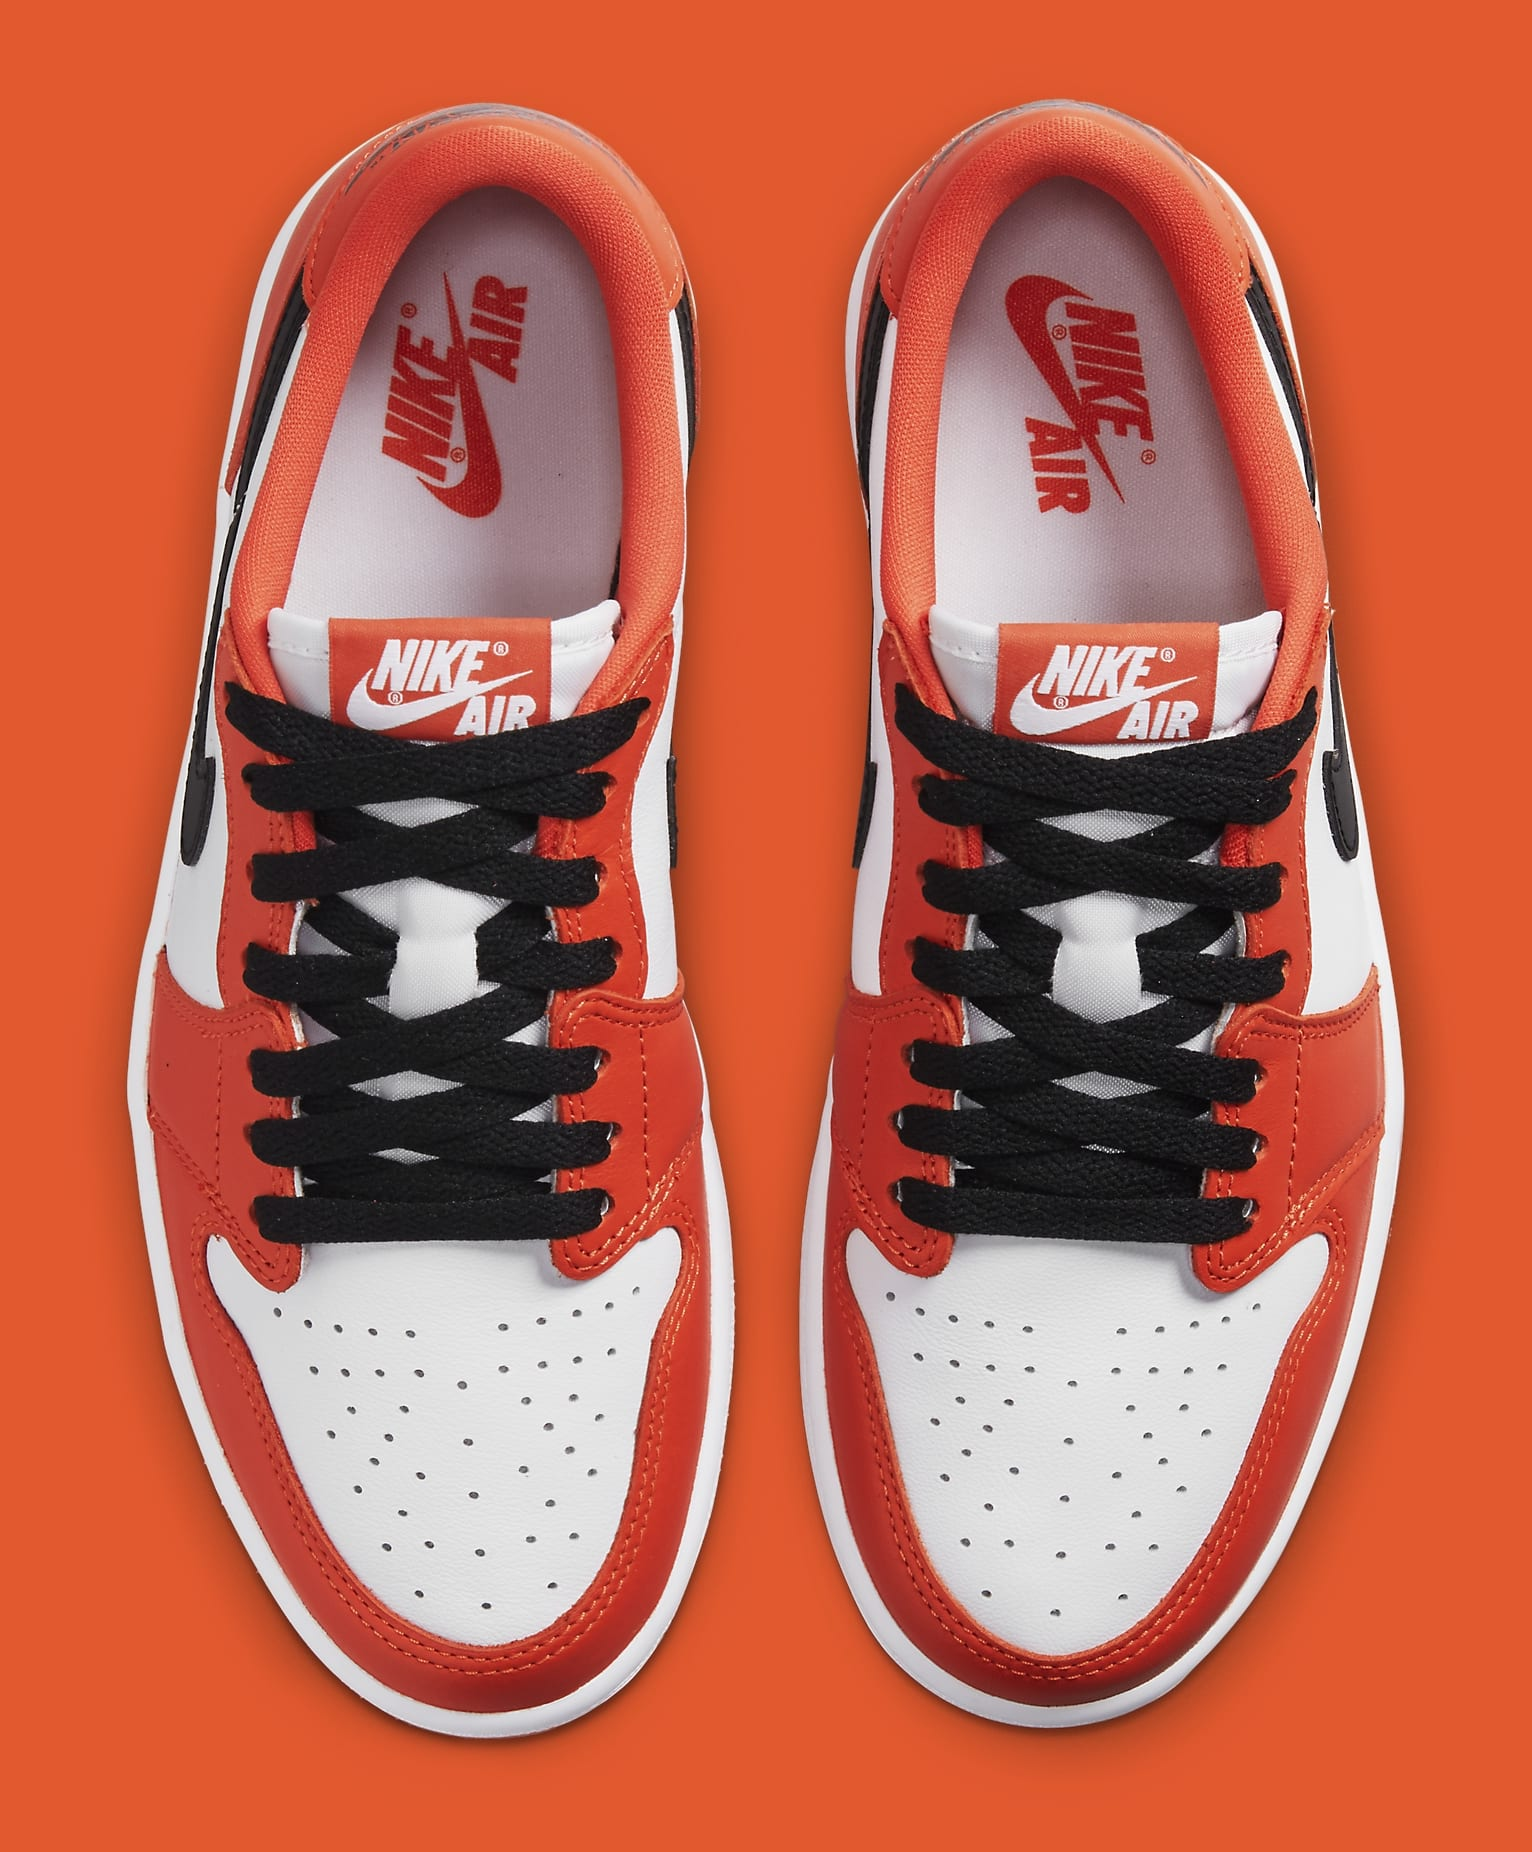 Air Jordan 1 Low OG 'Orange/White/Black' CZ0775-801 Top